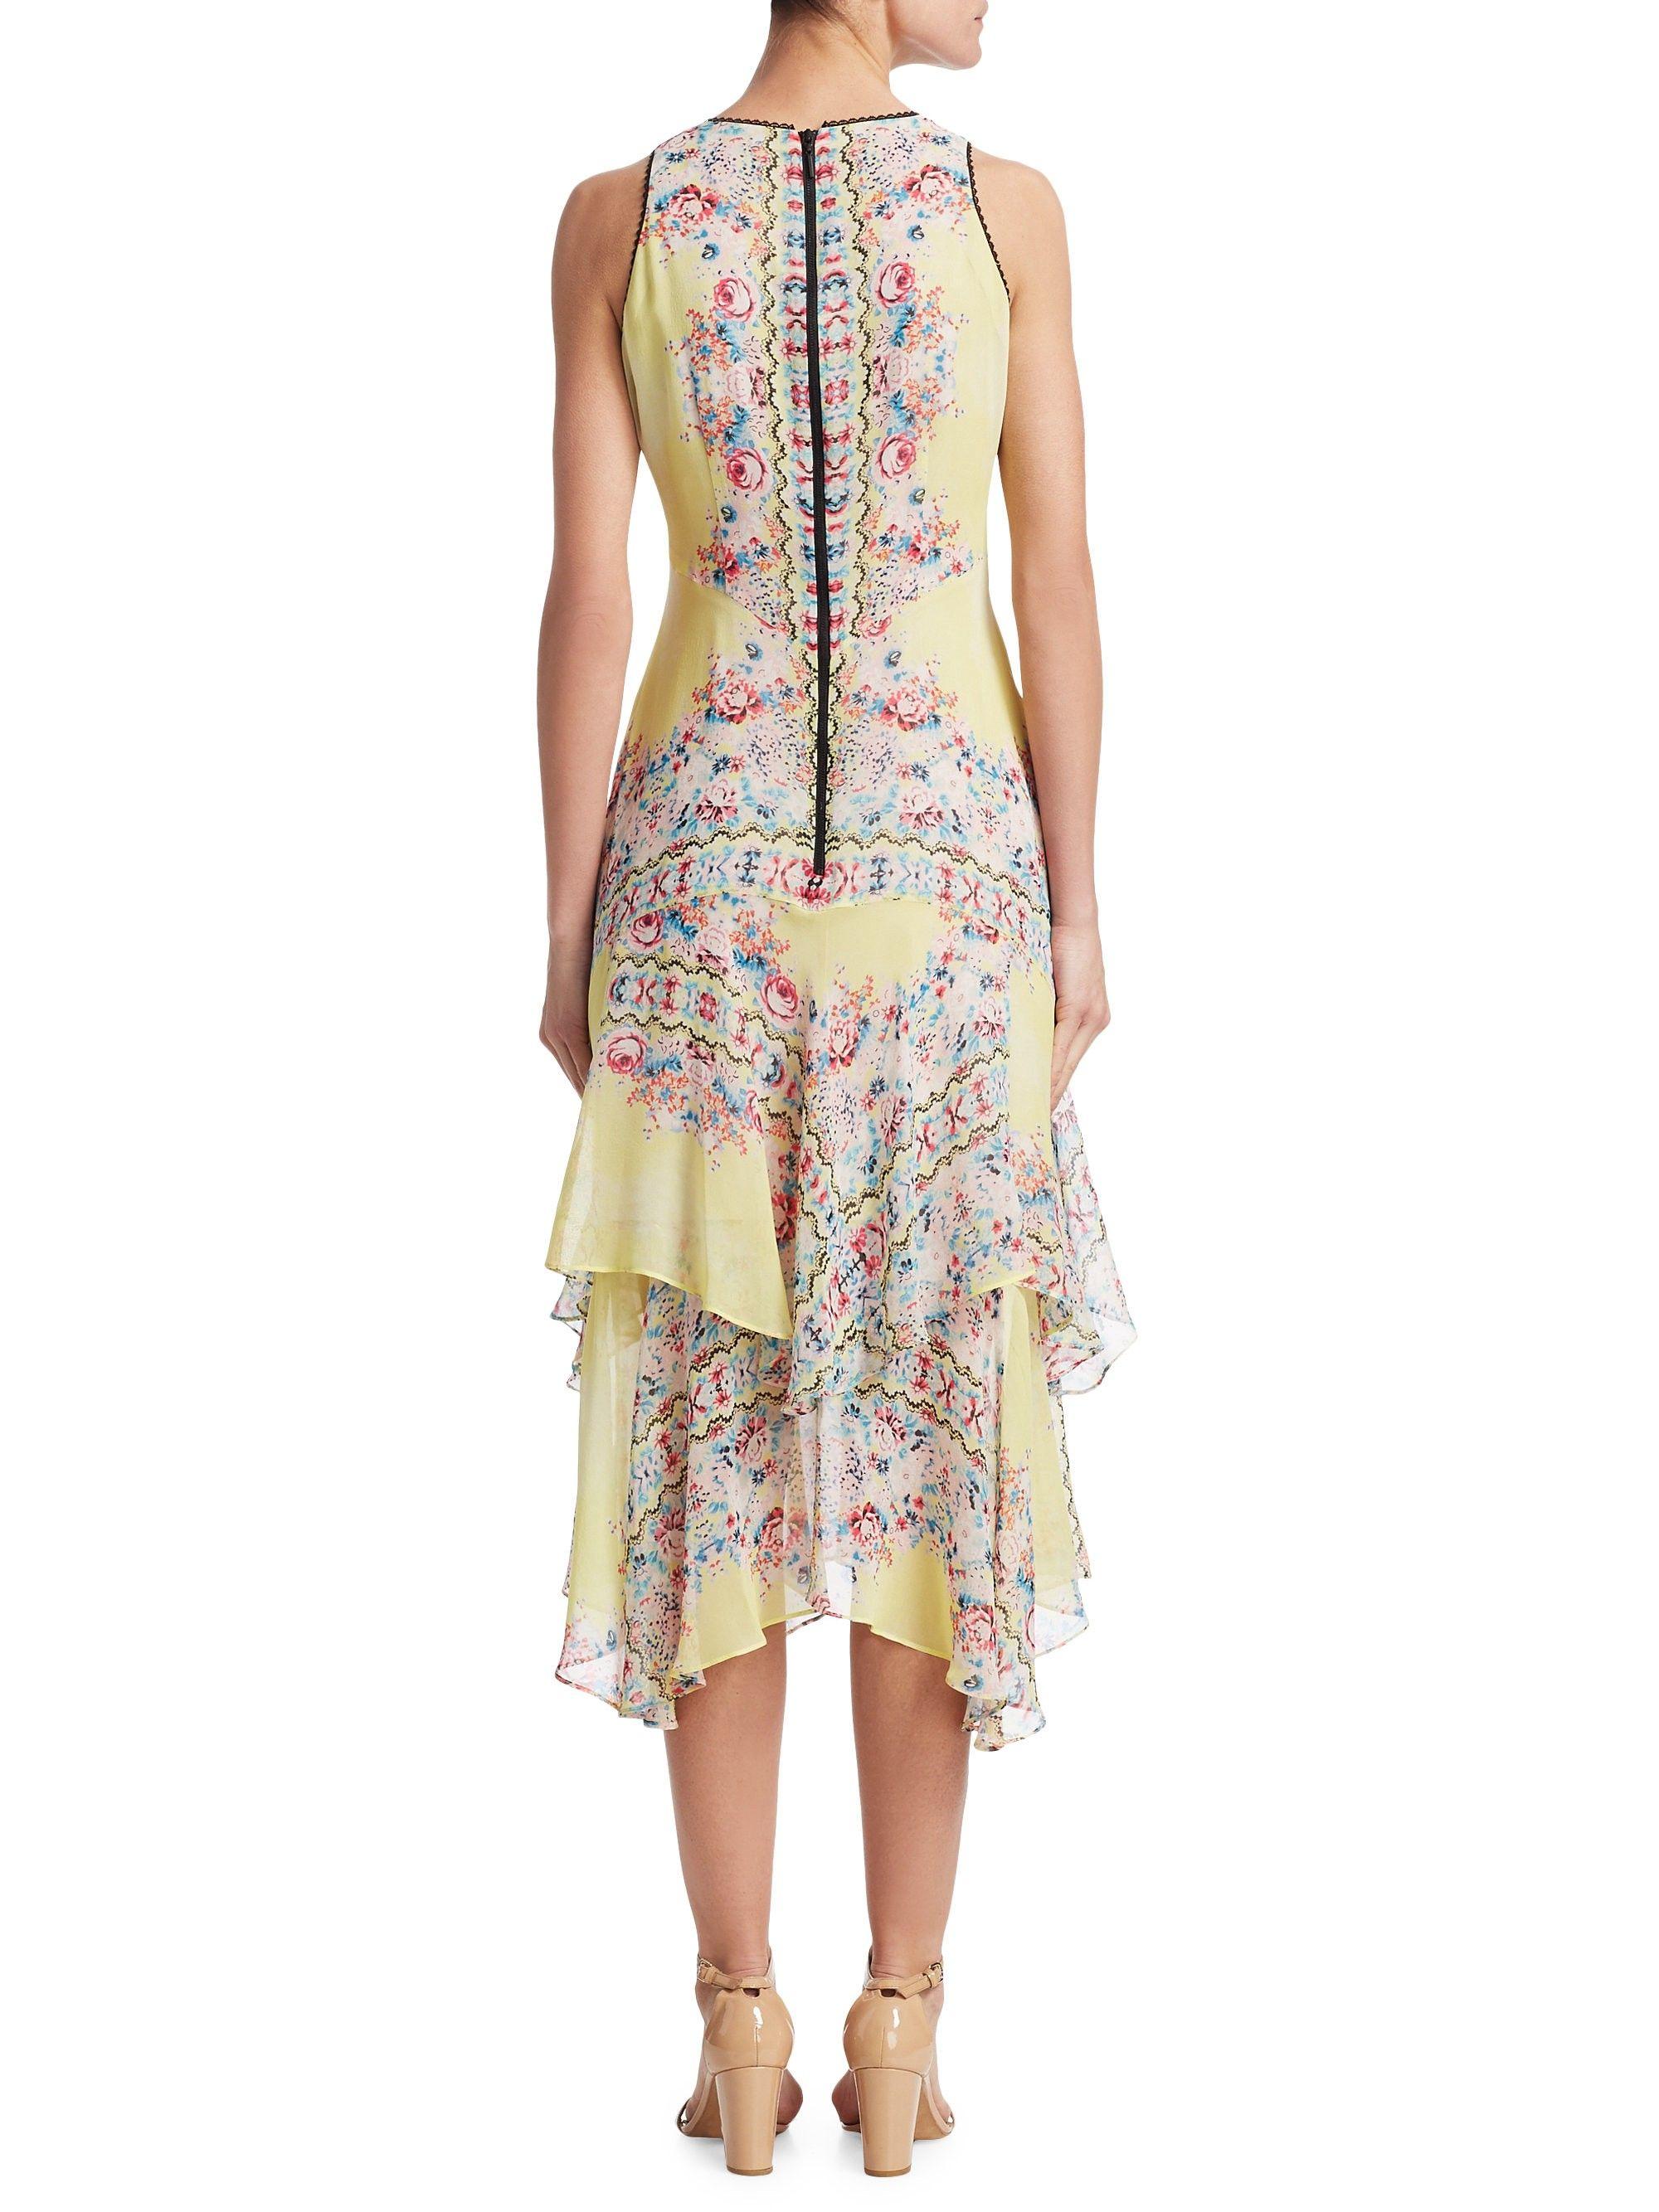 Nanette Lepore Canary Silk Dress Yellow Multi 10